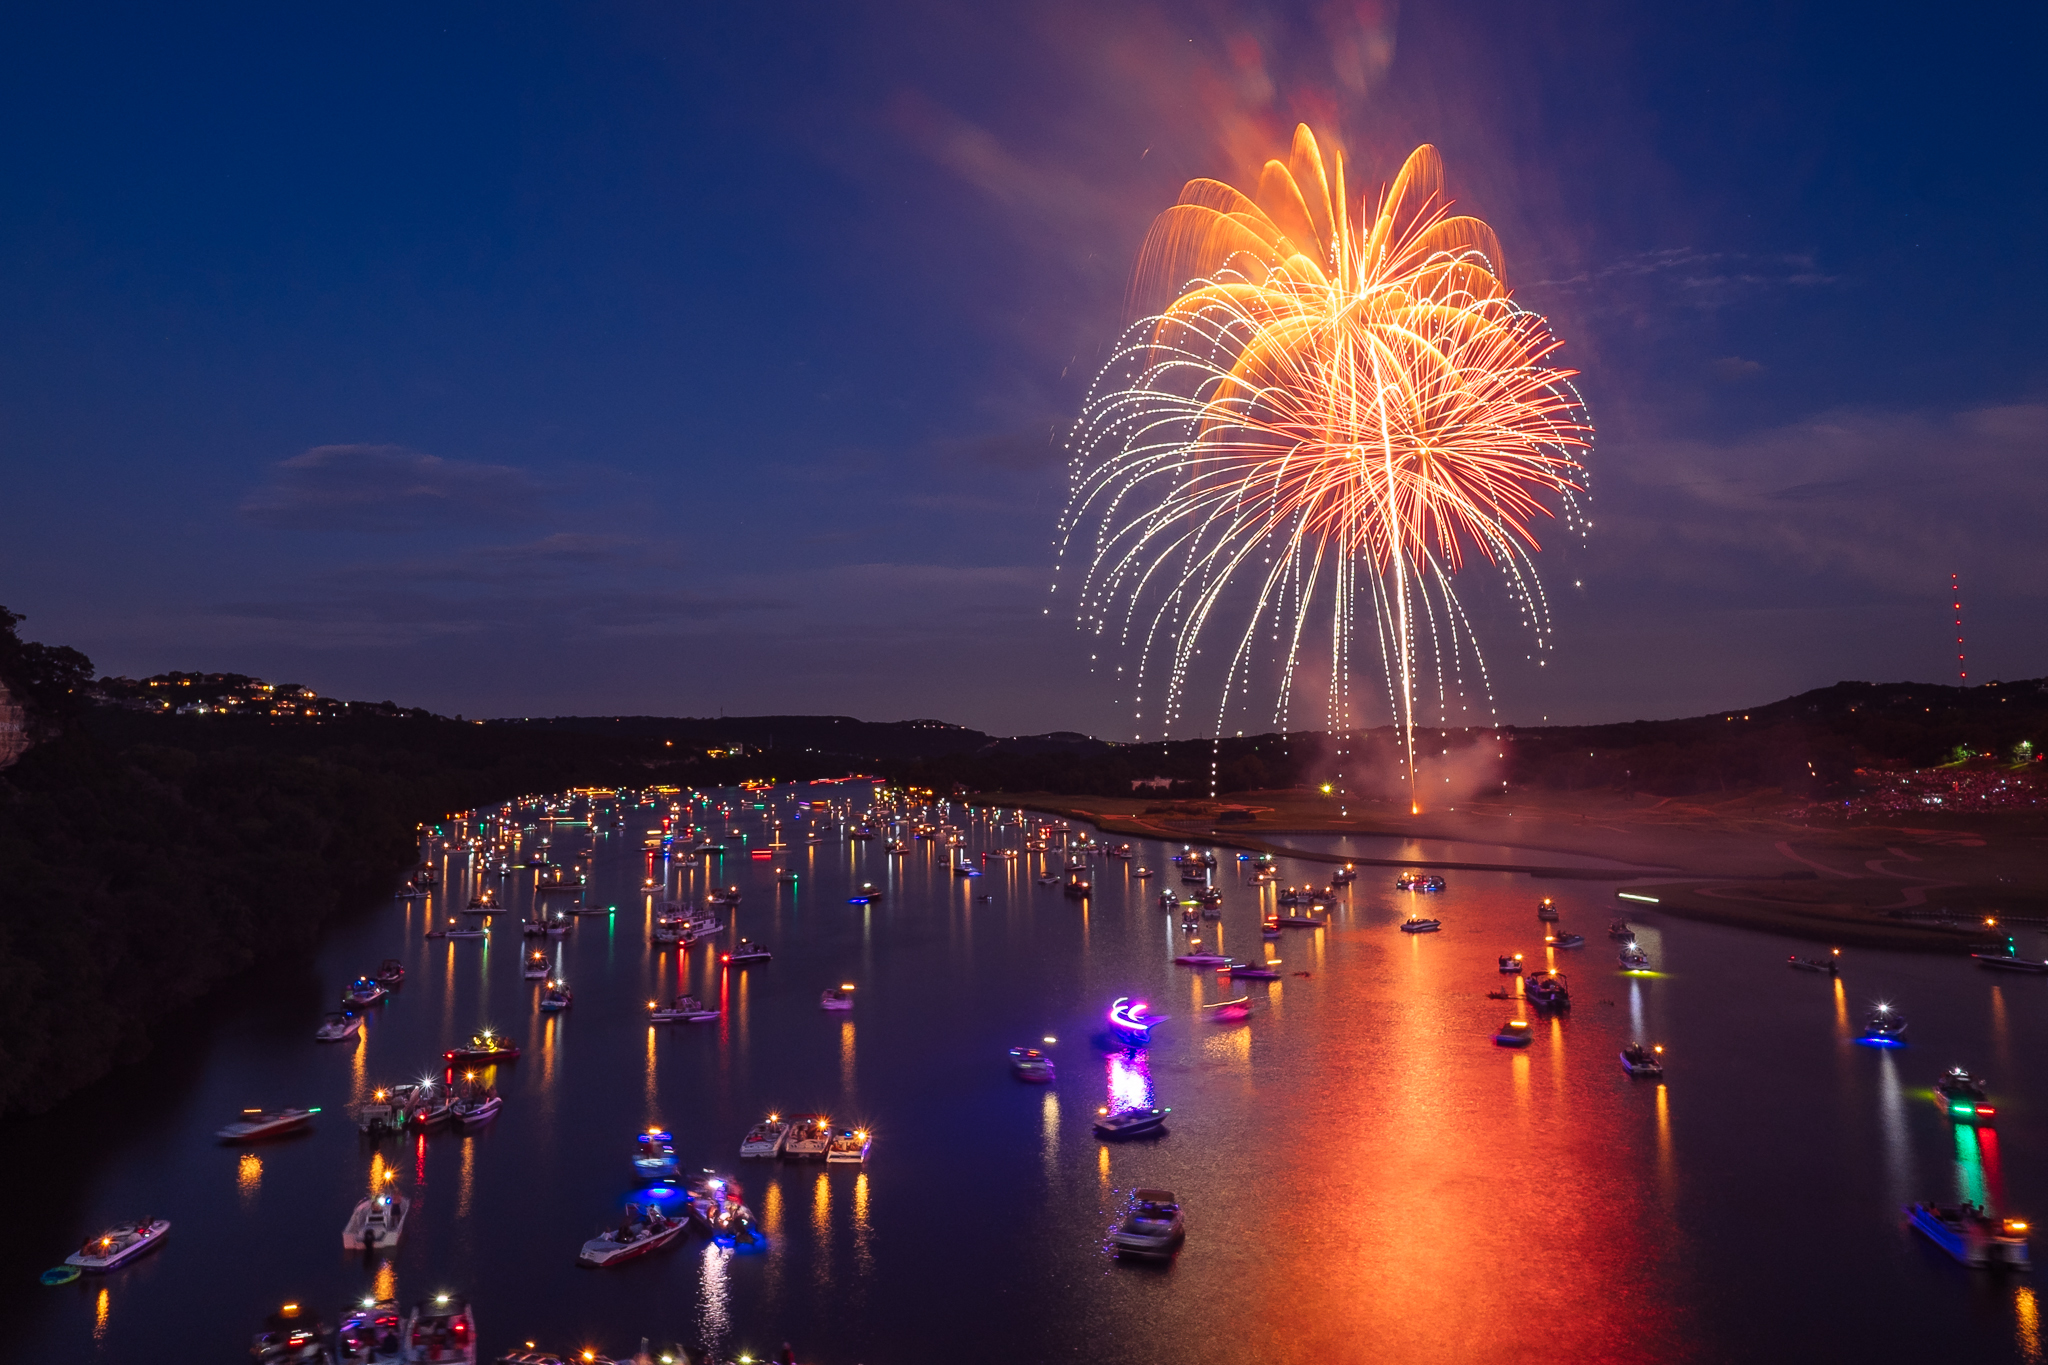 austin_fireworks_2014_9.jpg